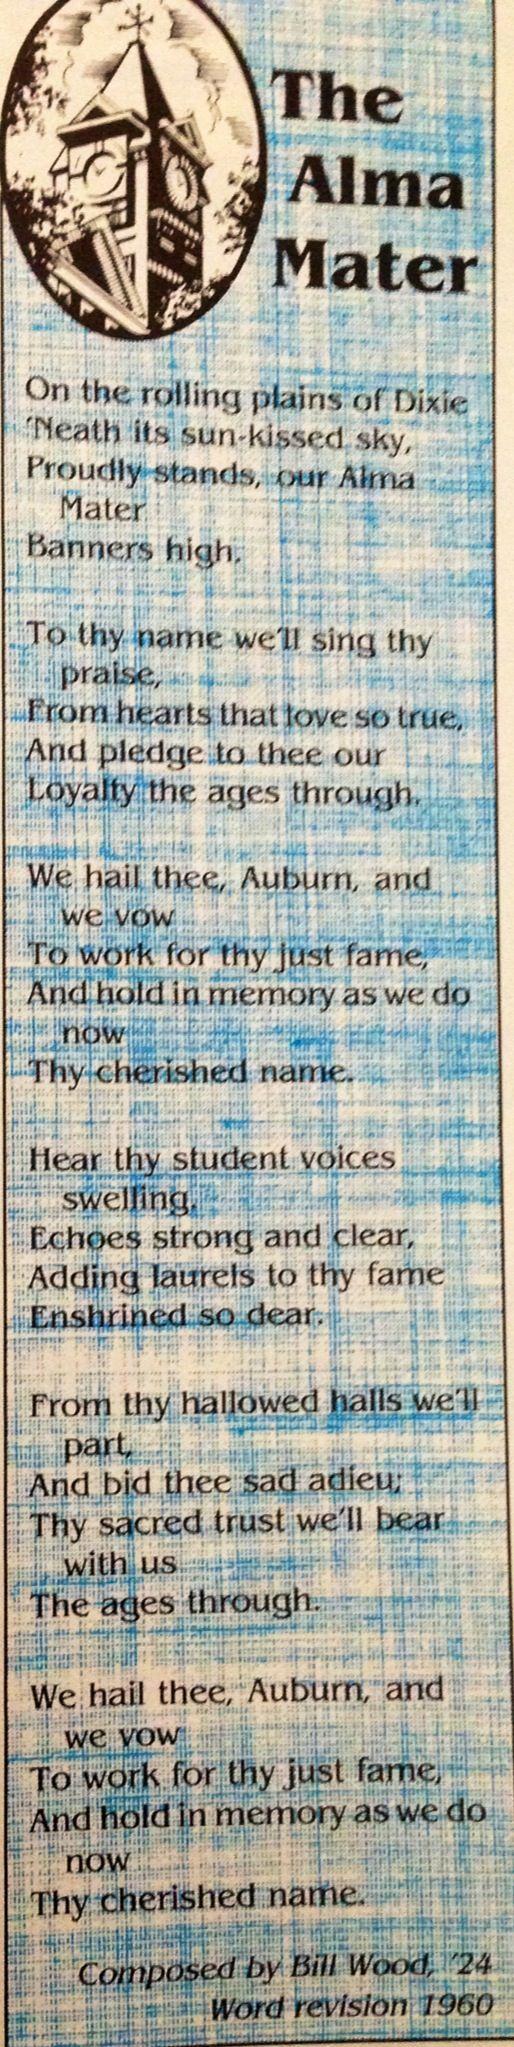 My Alma Mater. Auburn University college of education class of '92.